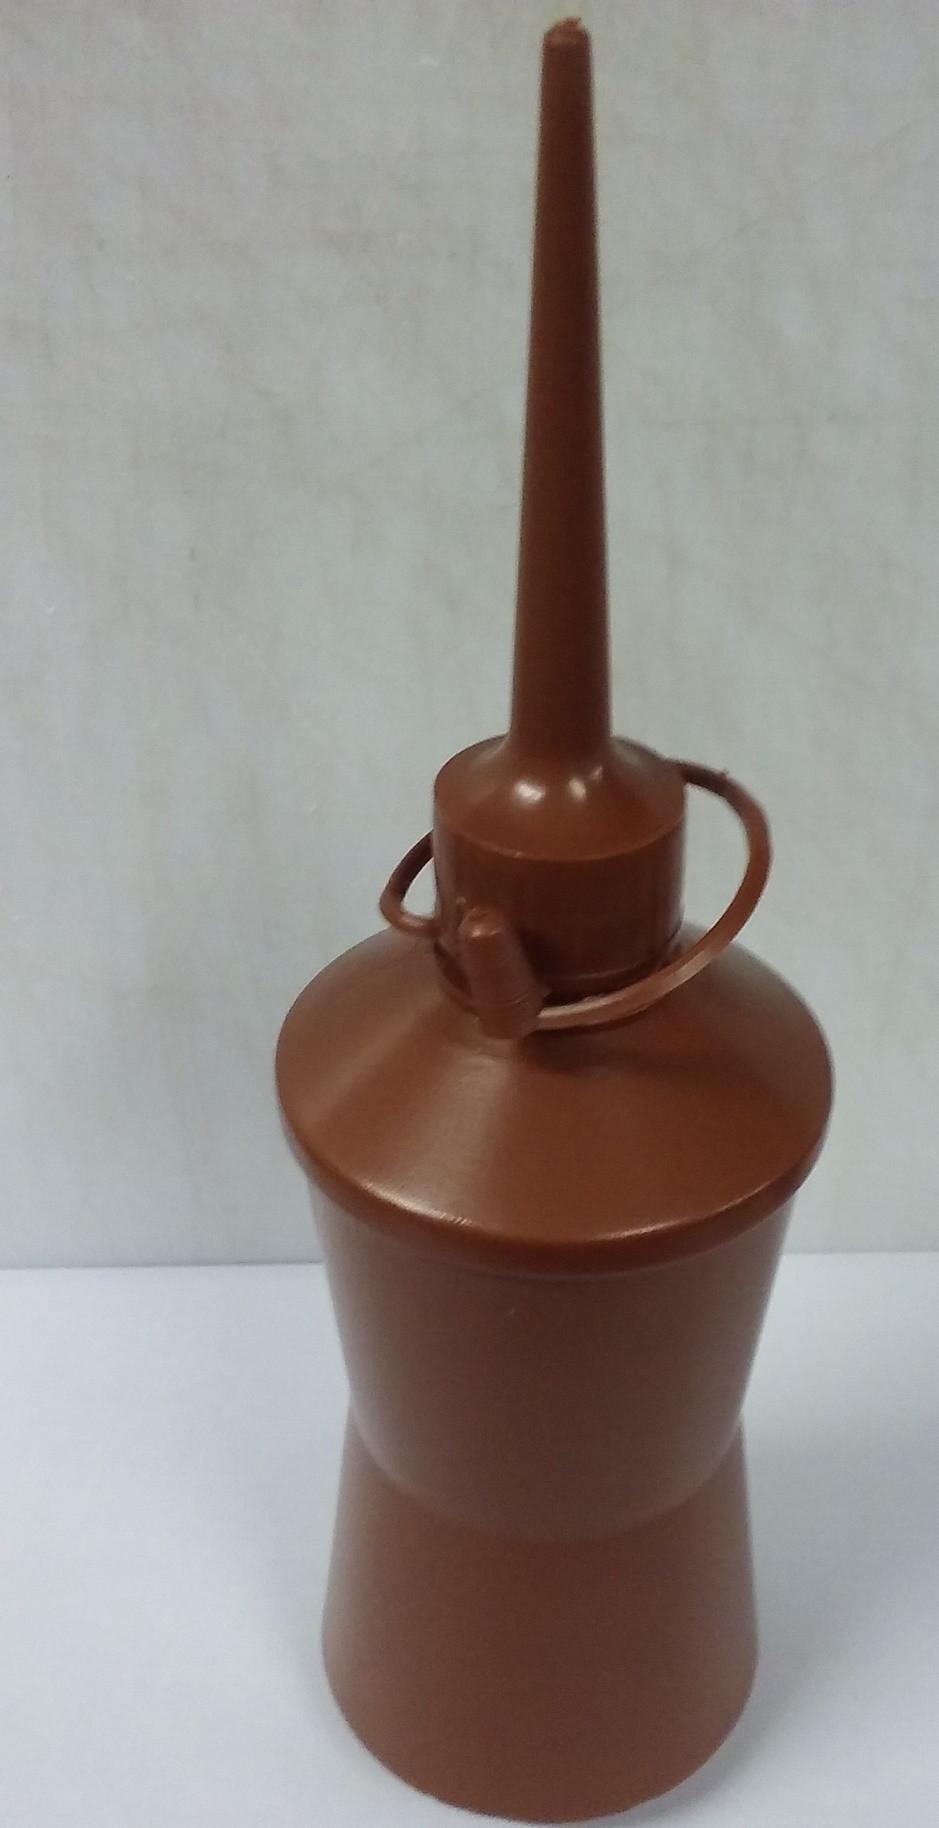 Frasco Plastico Virgem, Tipo Almotolia, cor Marrom e ou Ambar, 300ml c/5un